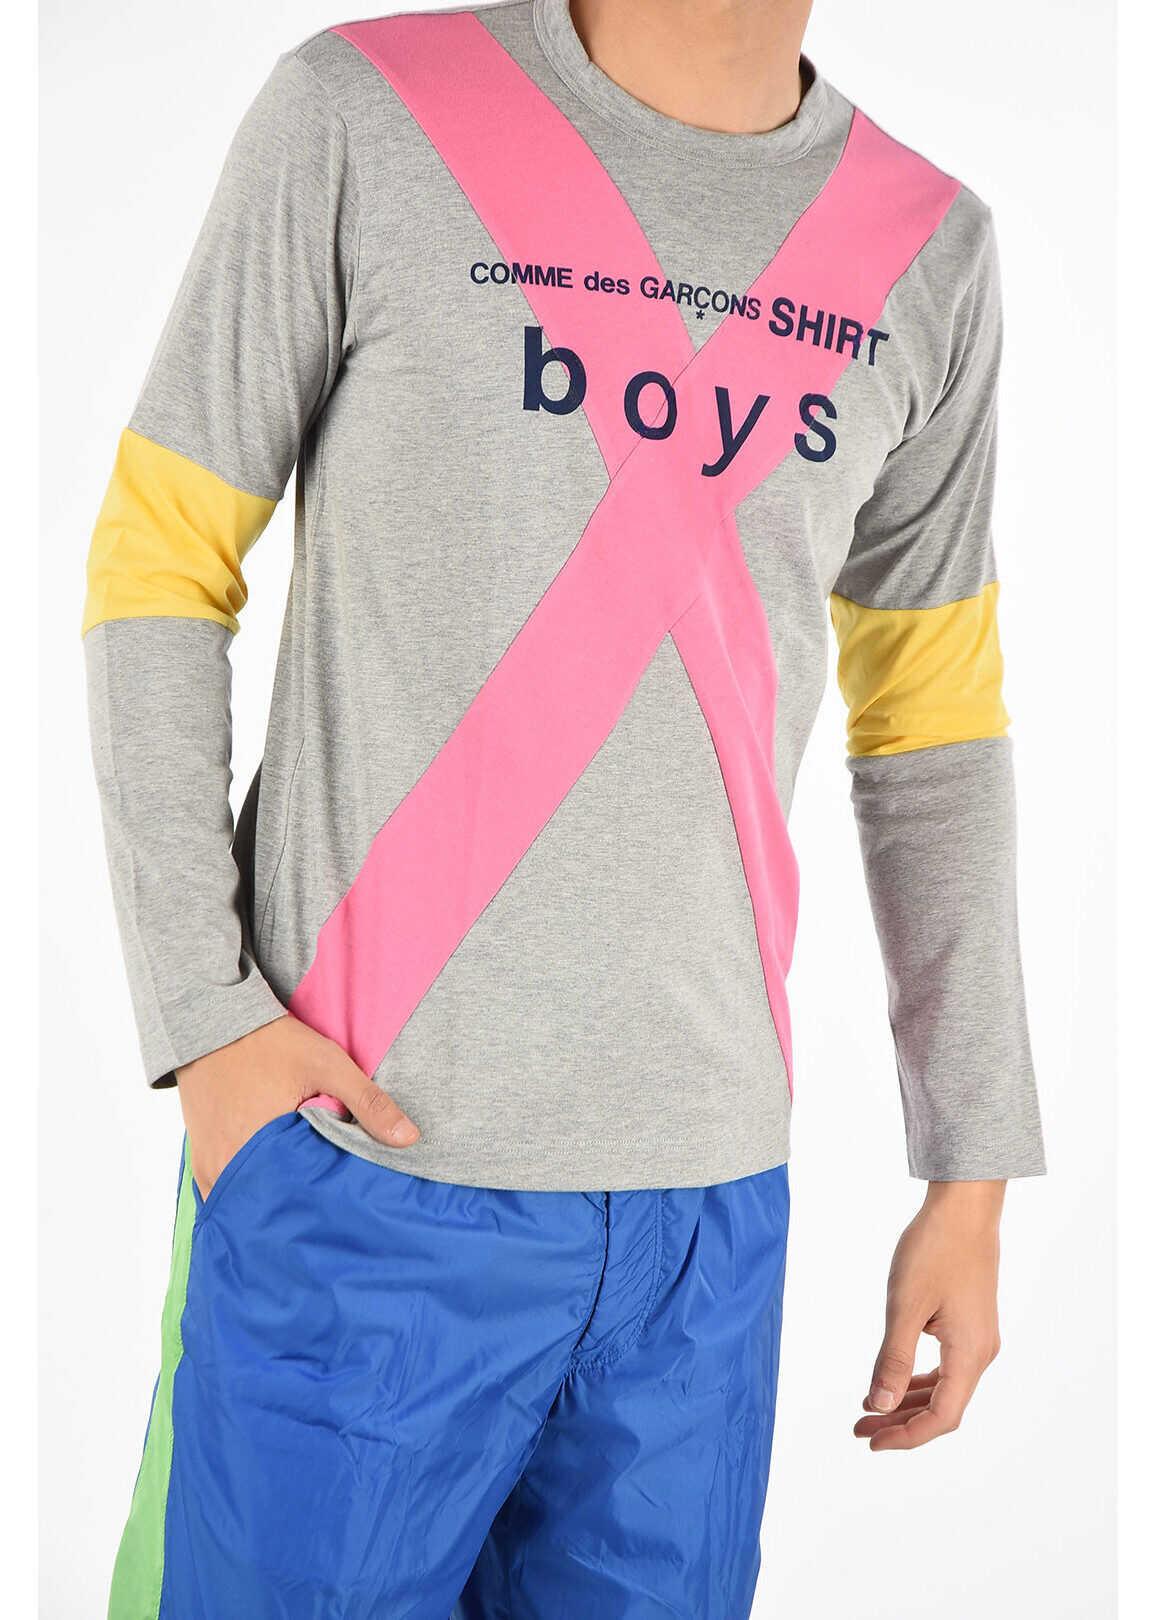 Comme des Garçons SHIRT BOYS Cotton Long Sleeve T-shirt GRAY imagine